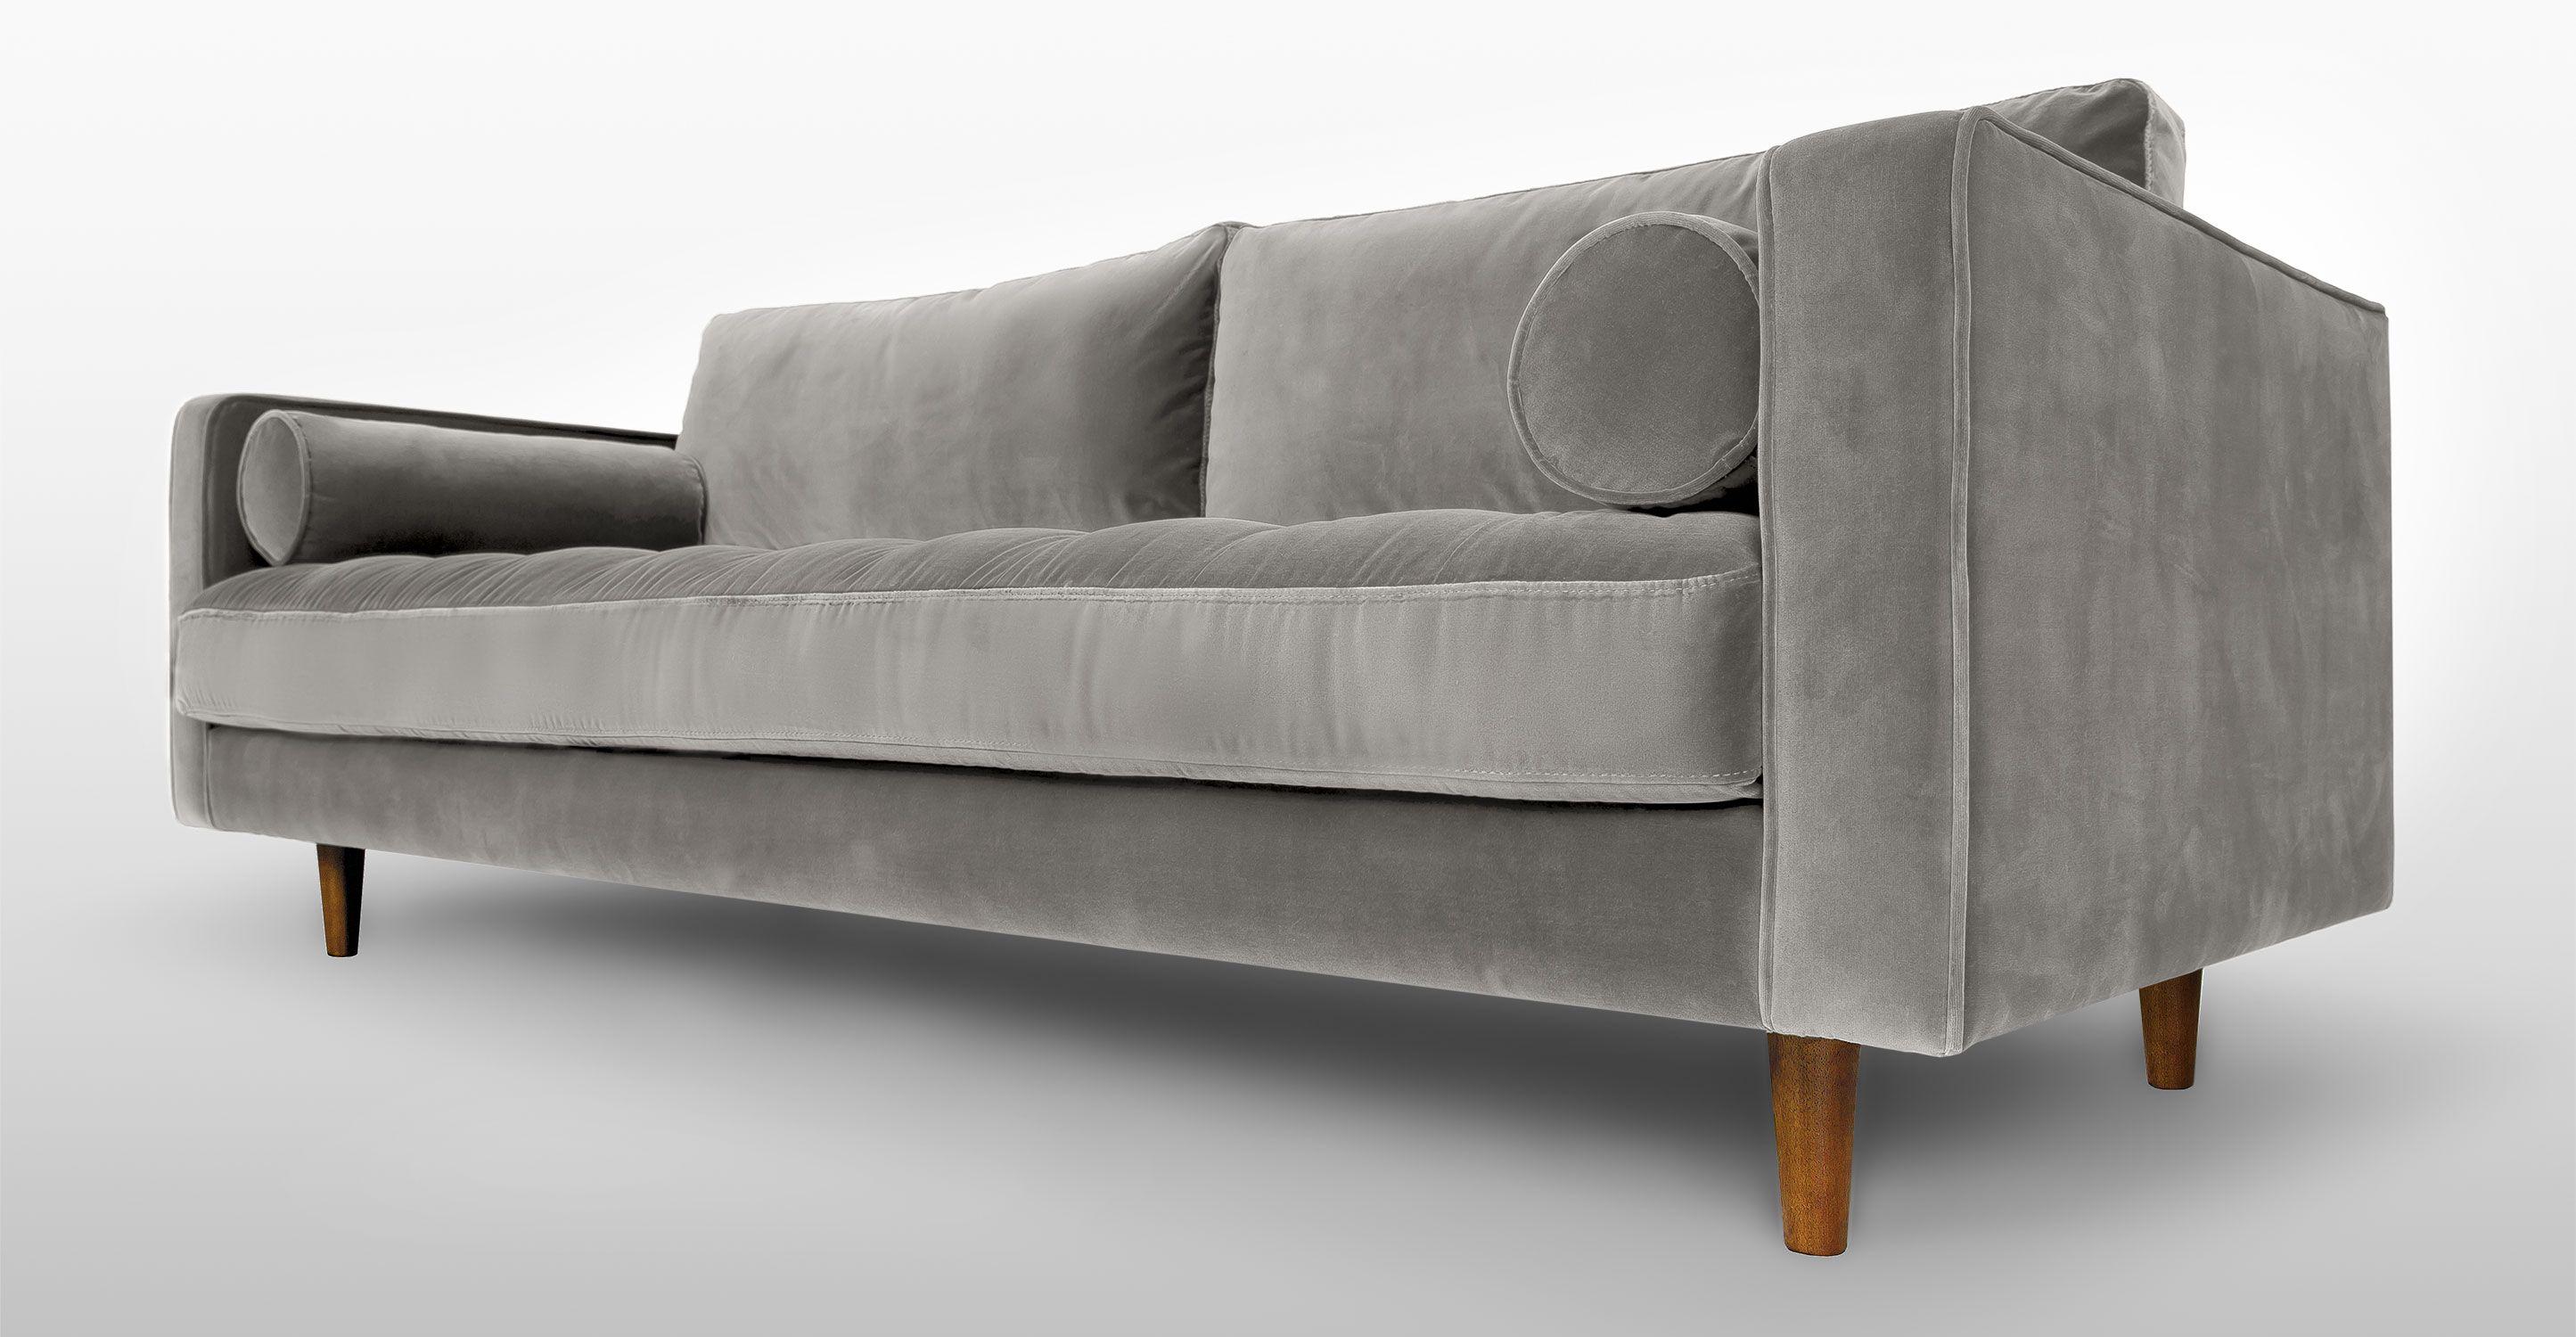 Mid Century Style Sofa Canada Most Comfortable Sofas Ever Sven Intuition Gray B 43k Pinterest Scandinavian